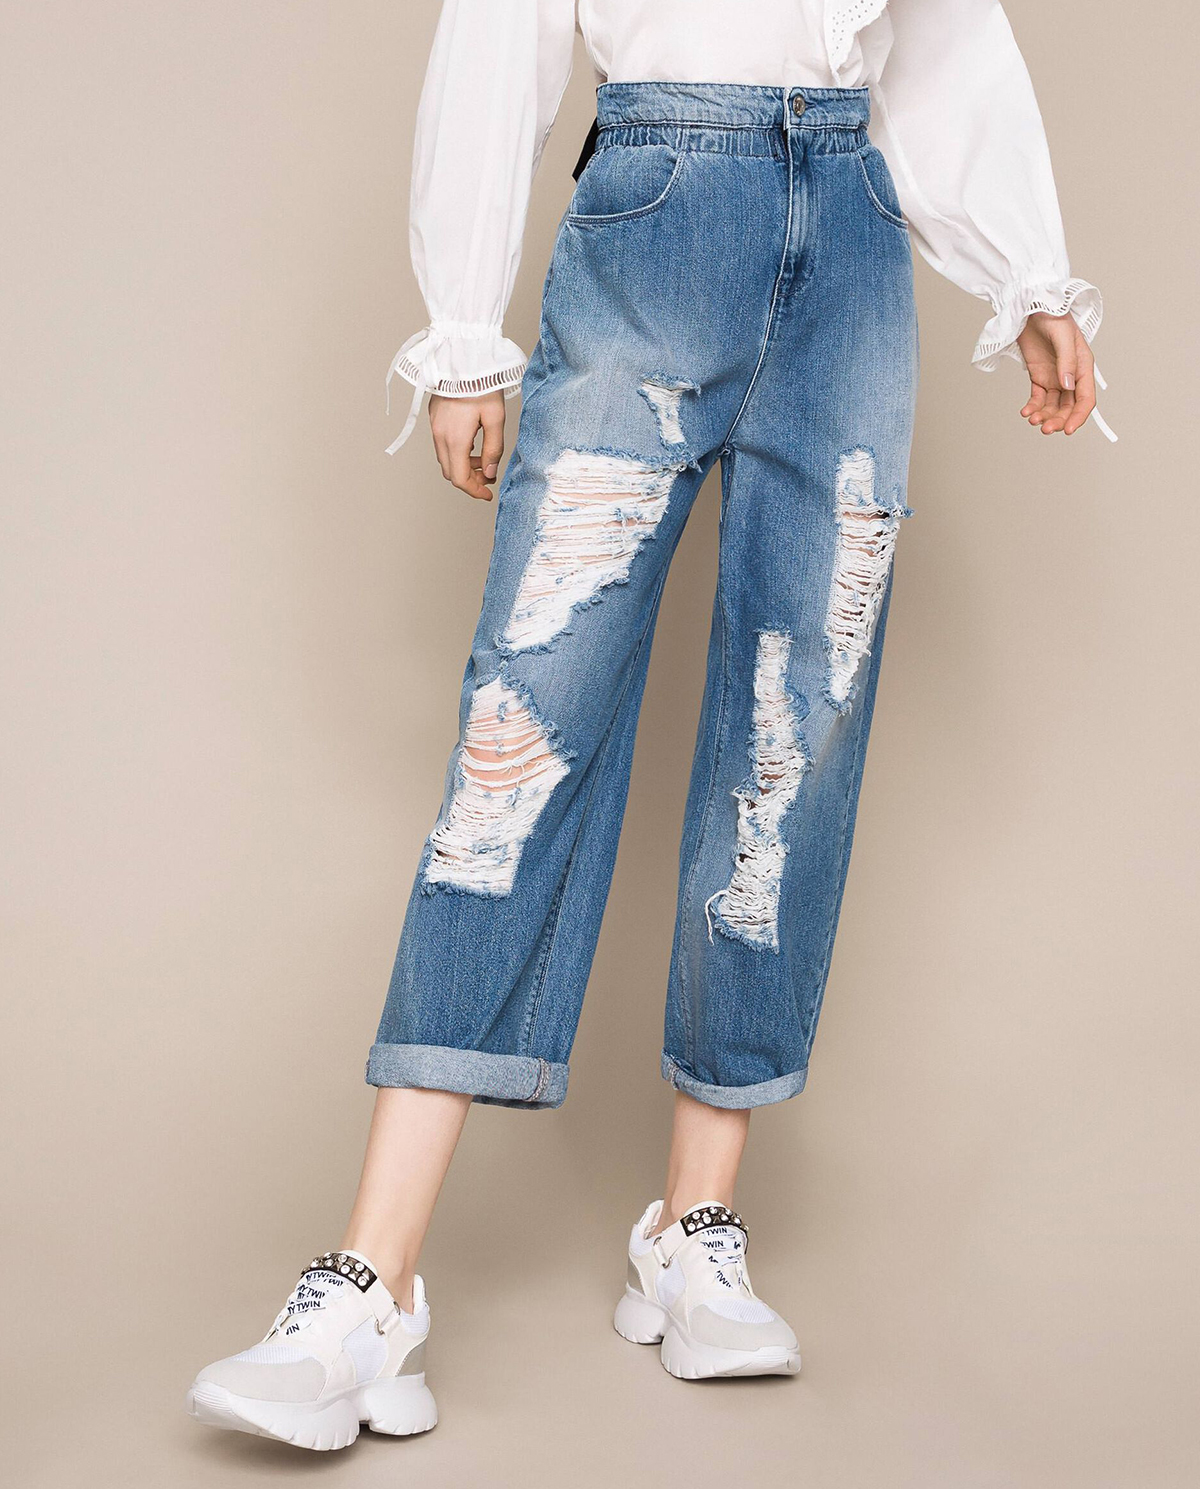 Damskie jeansy z dziurami loose fit twinset 201MT2344 01104